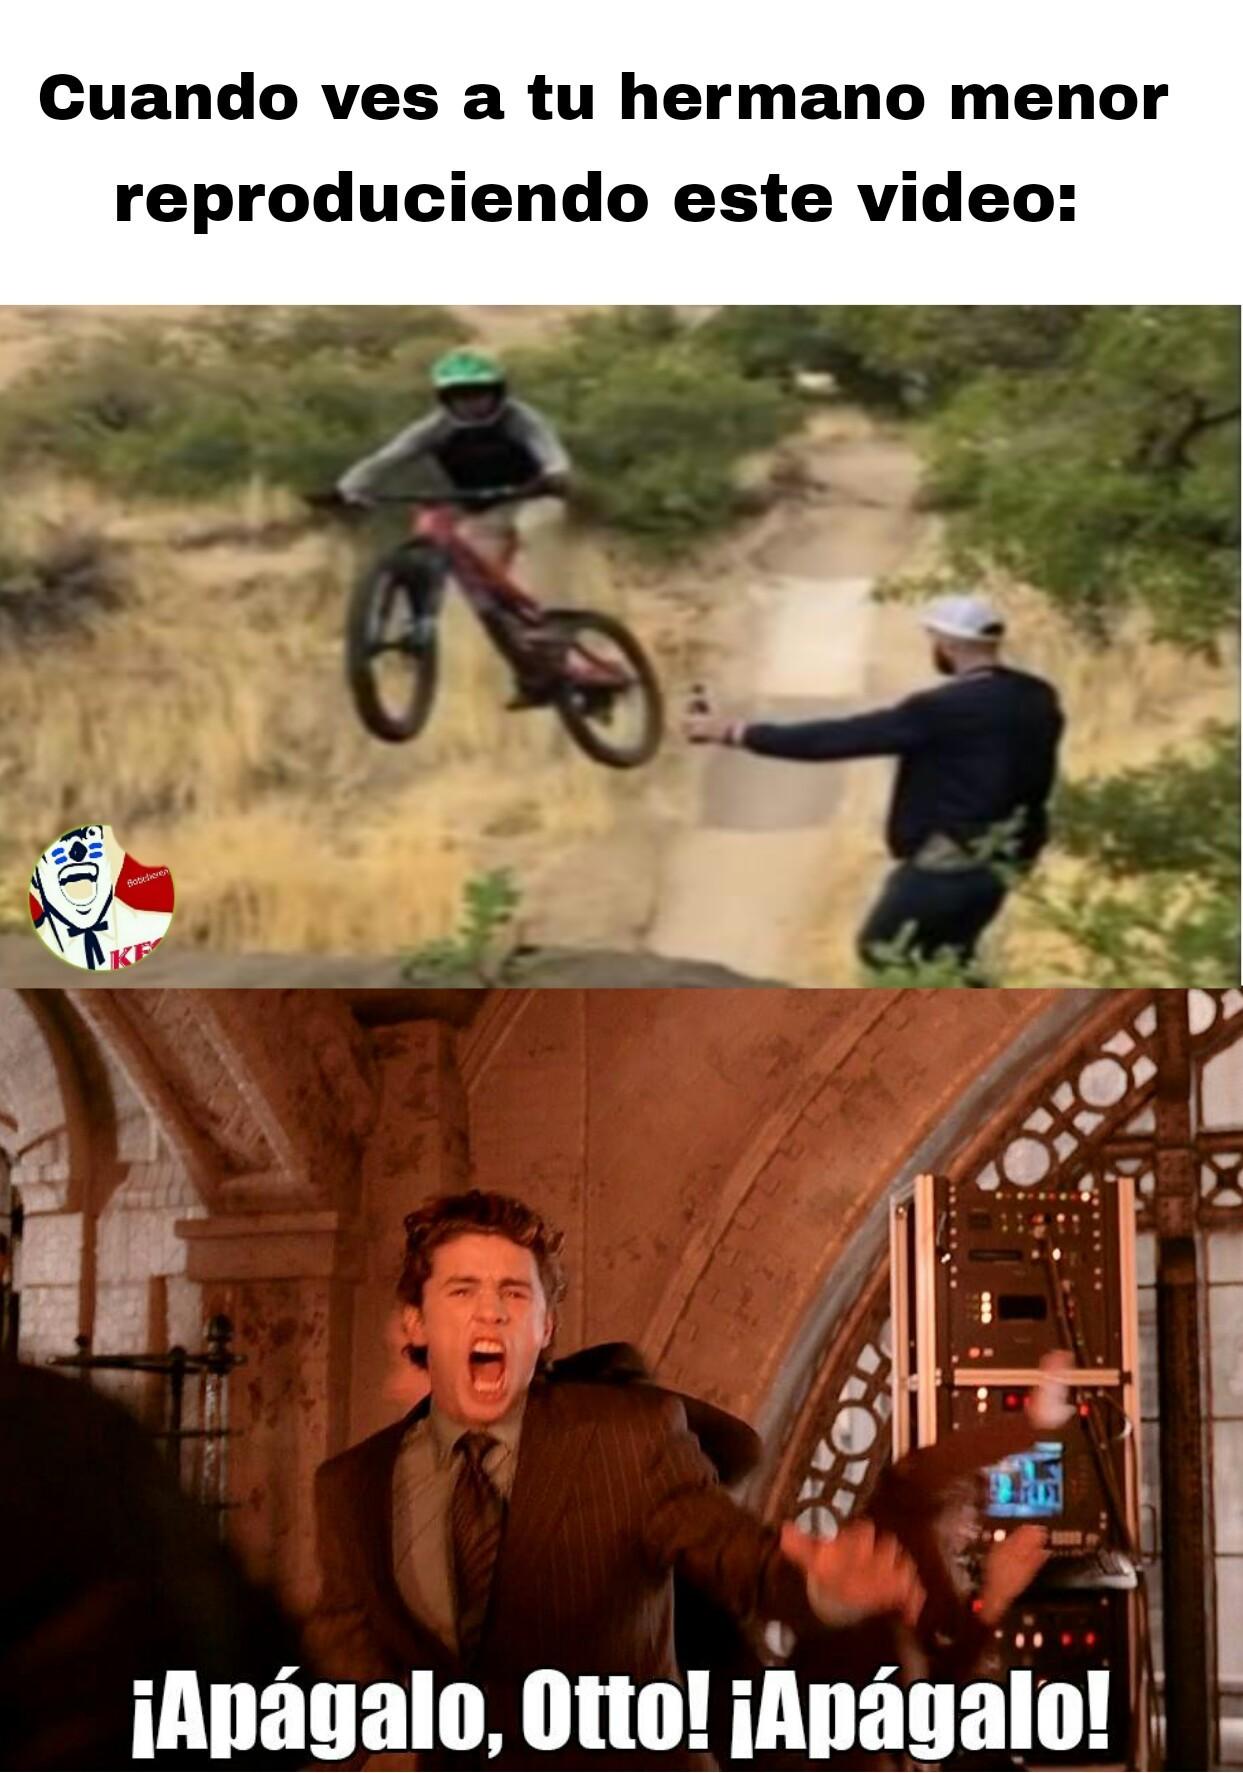 Apagalo Otto! Apagalo! - meme